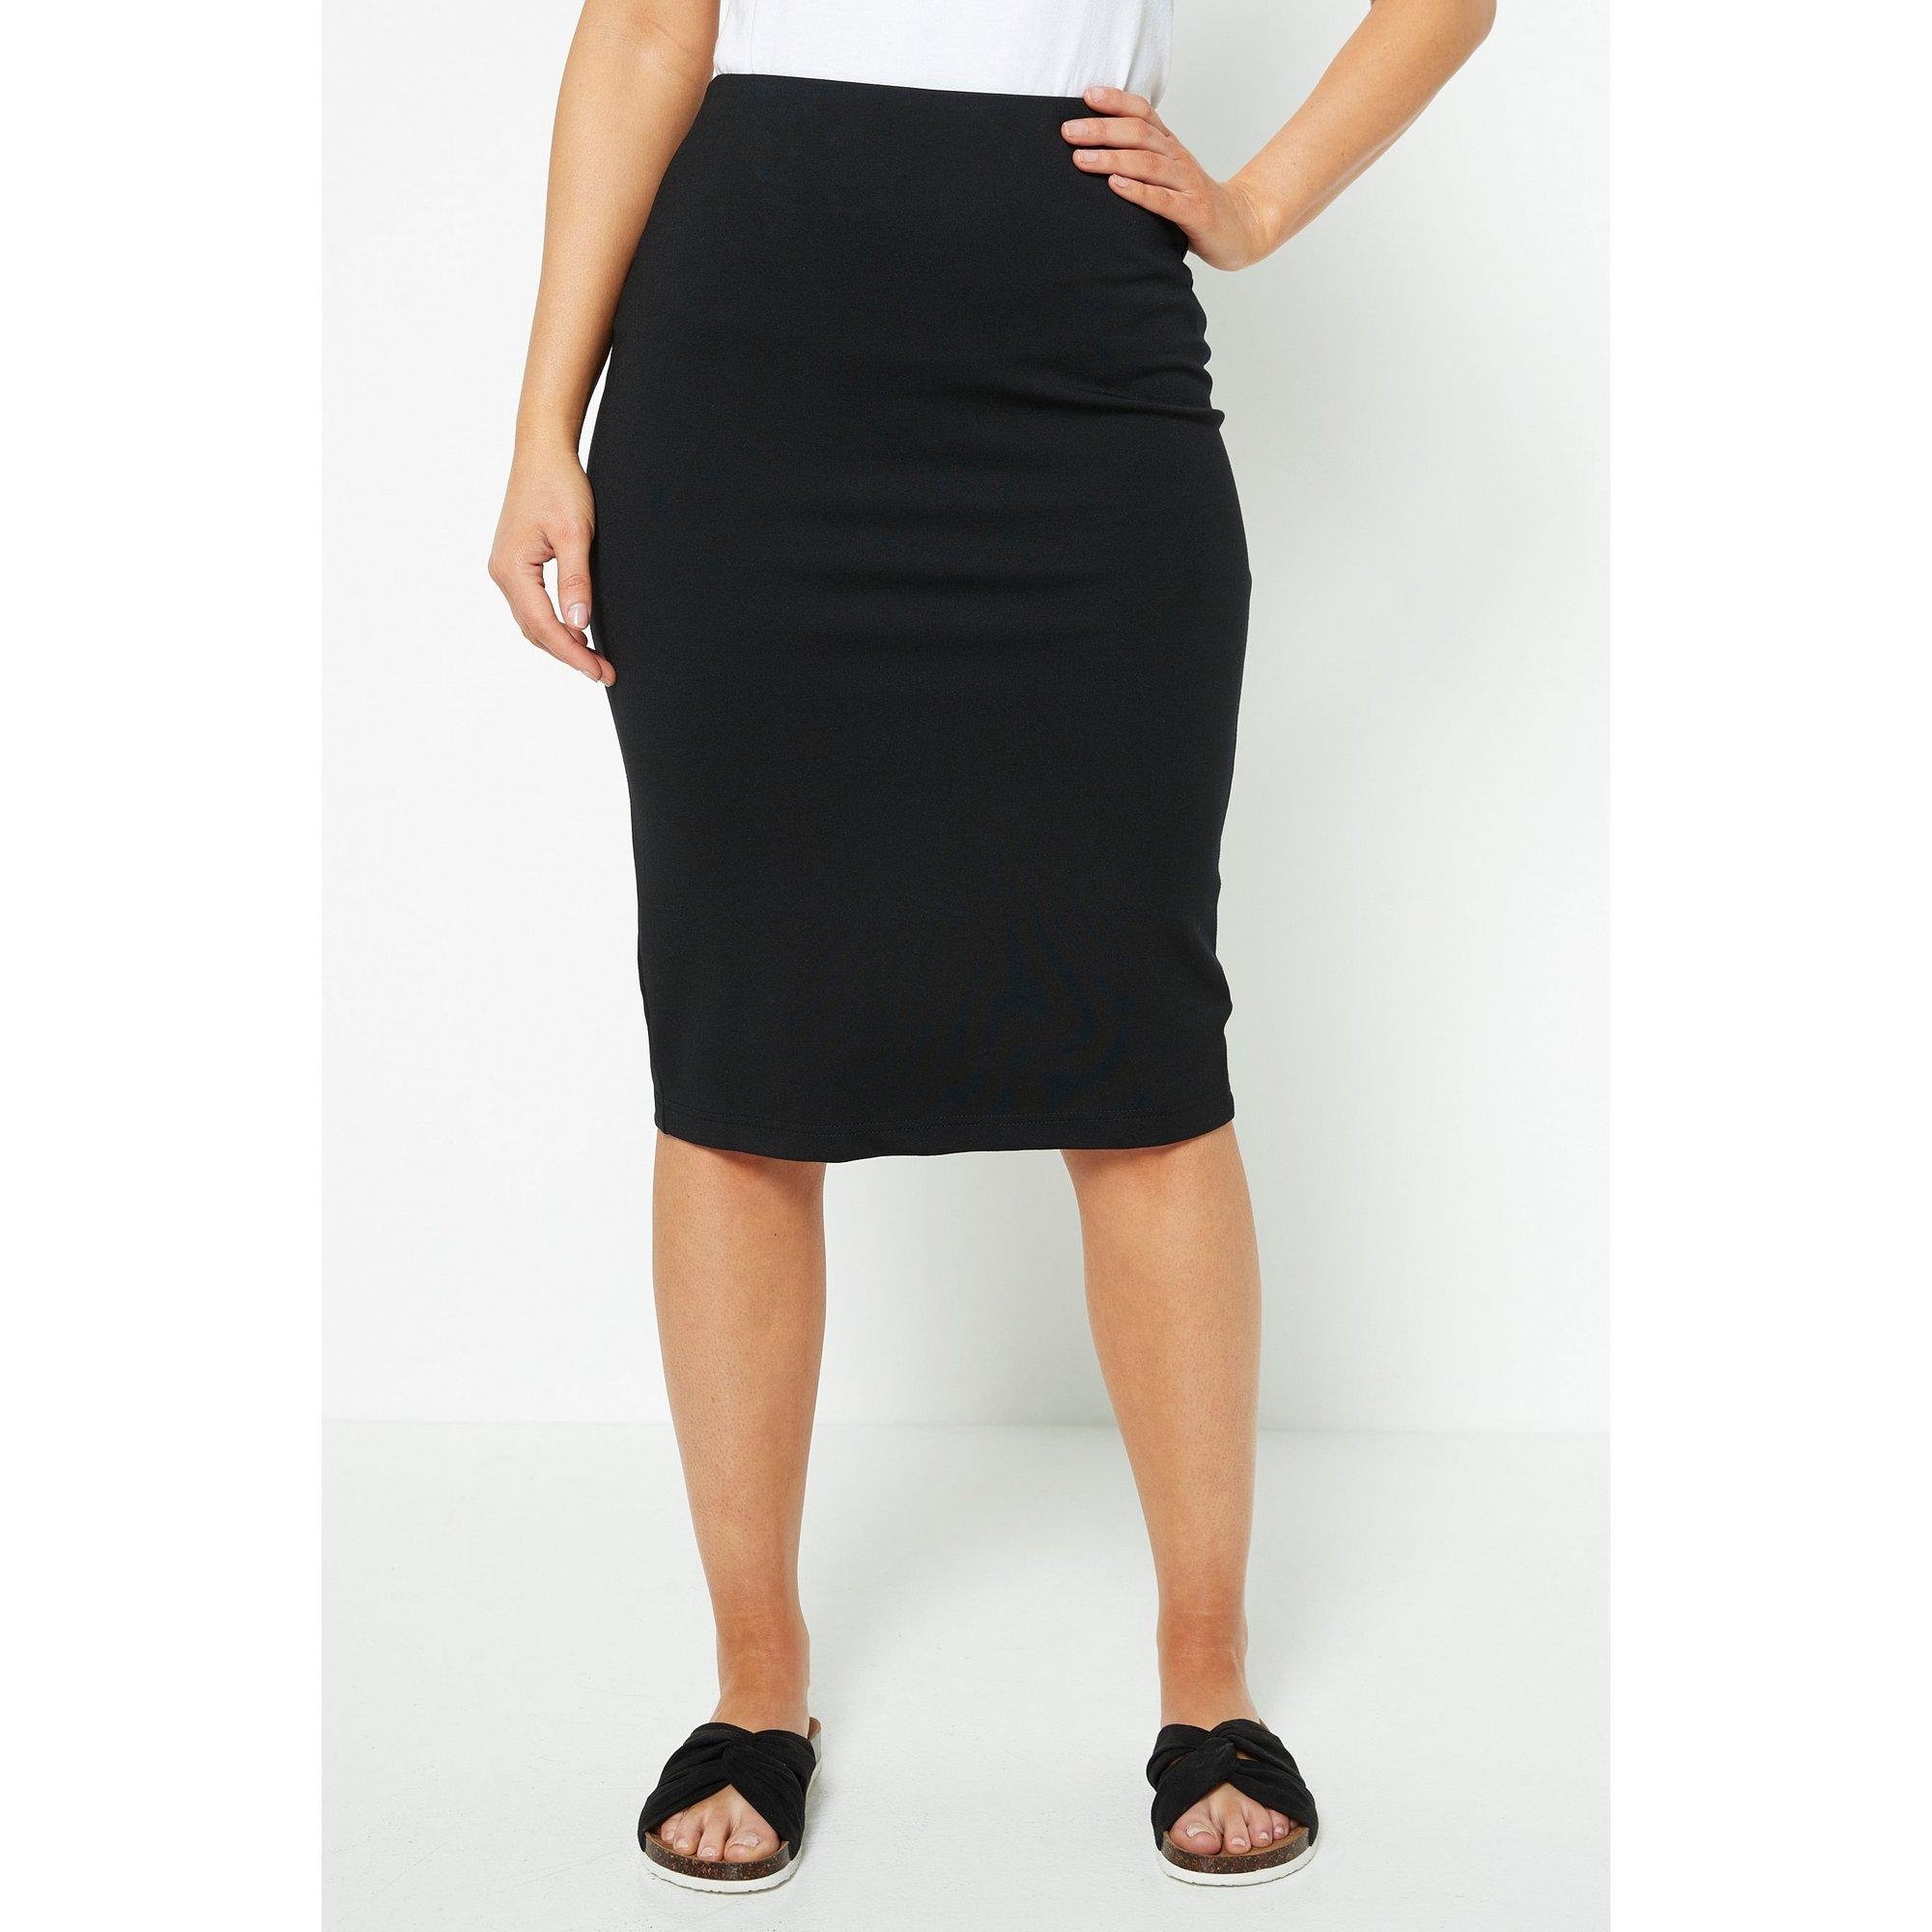 Image of Black Ponte Pencil Skirt